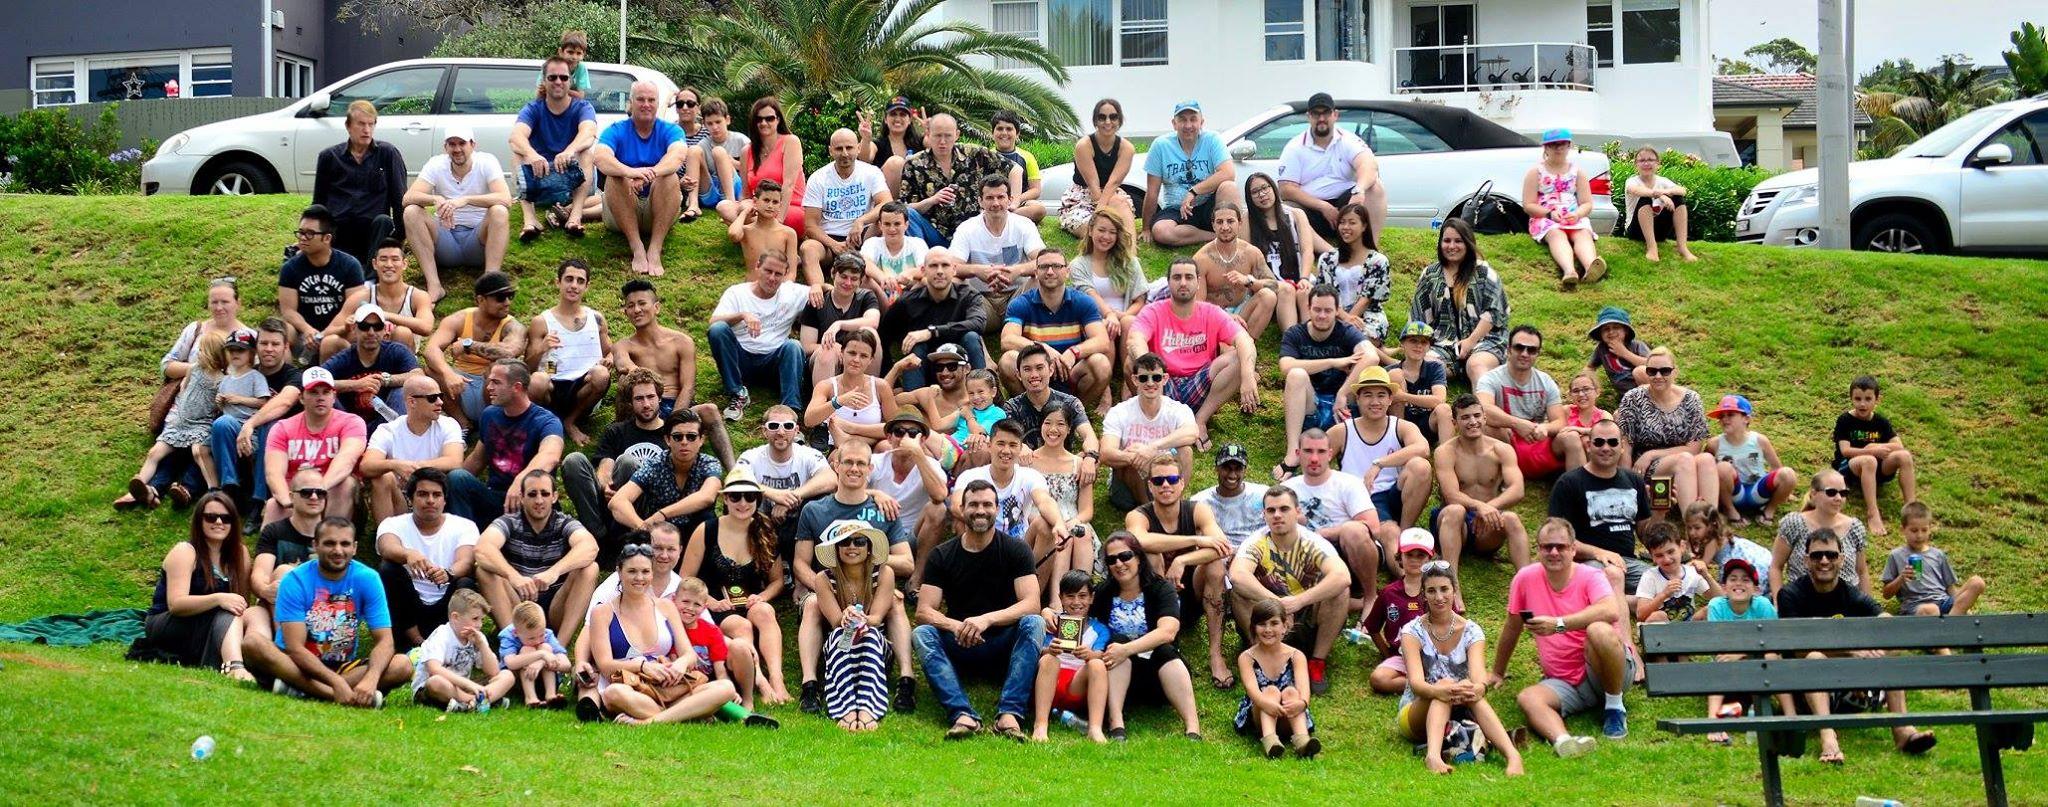 SPMA Christmas Party 2014